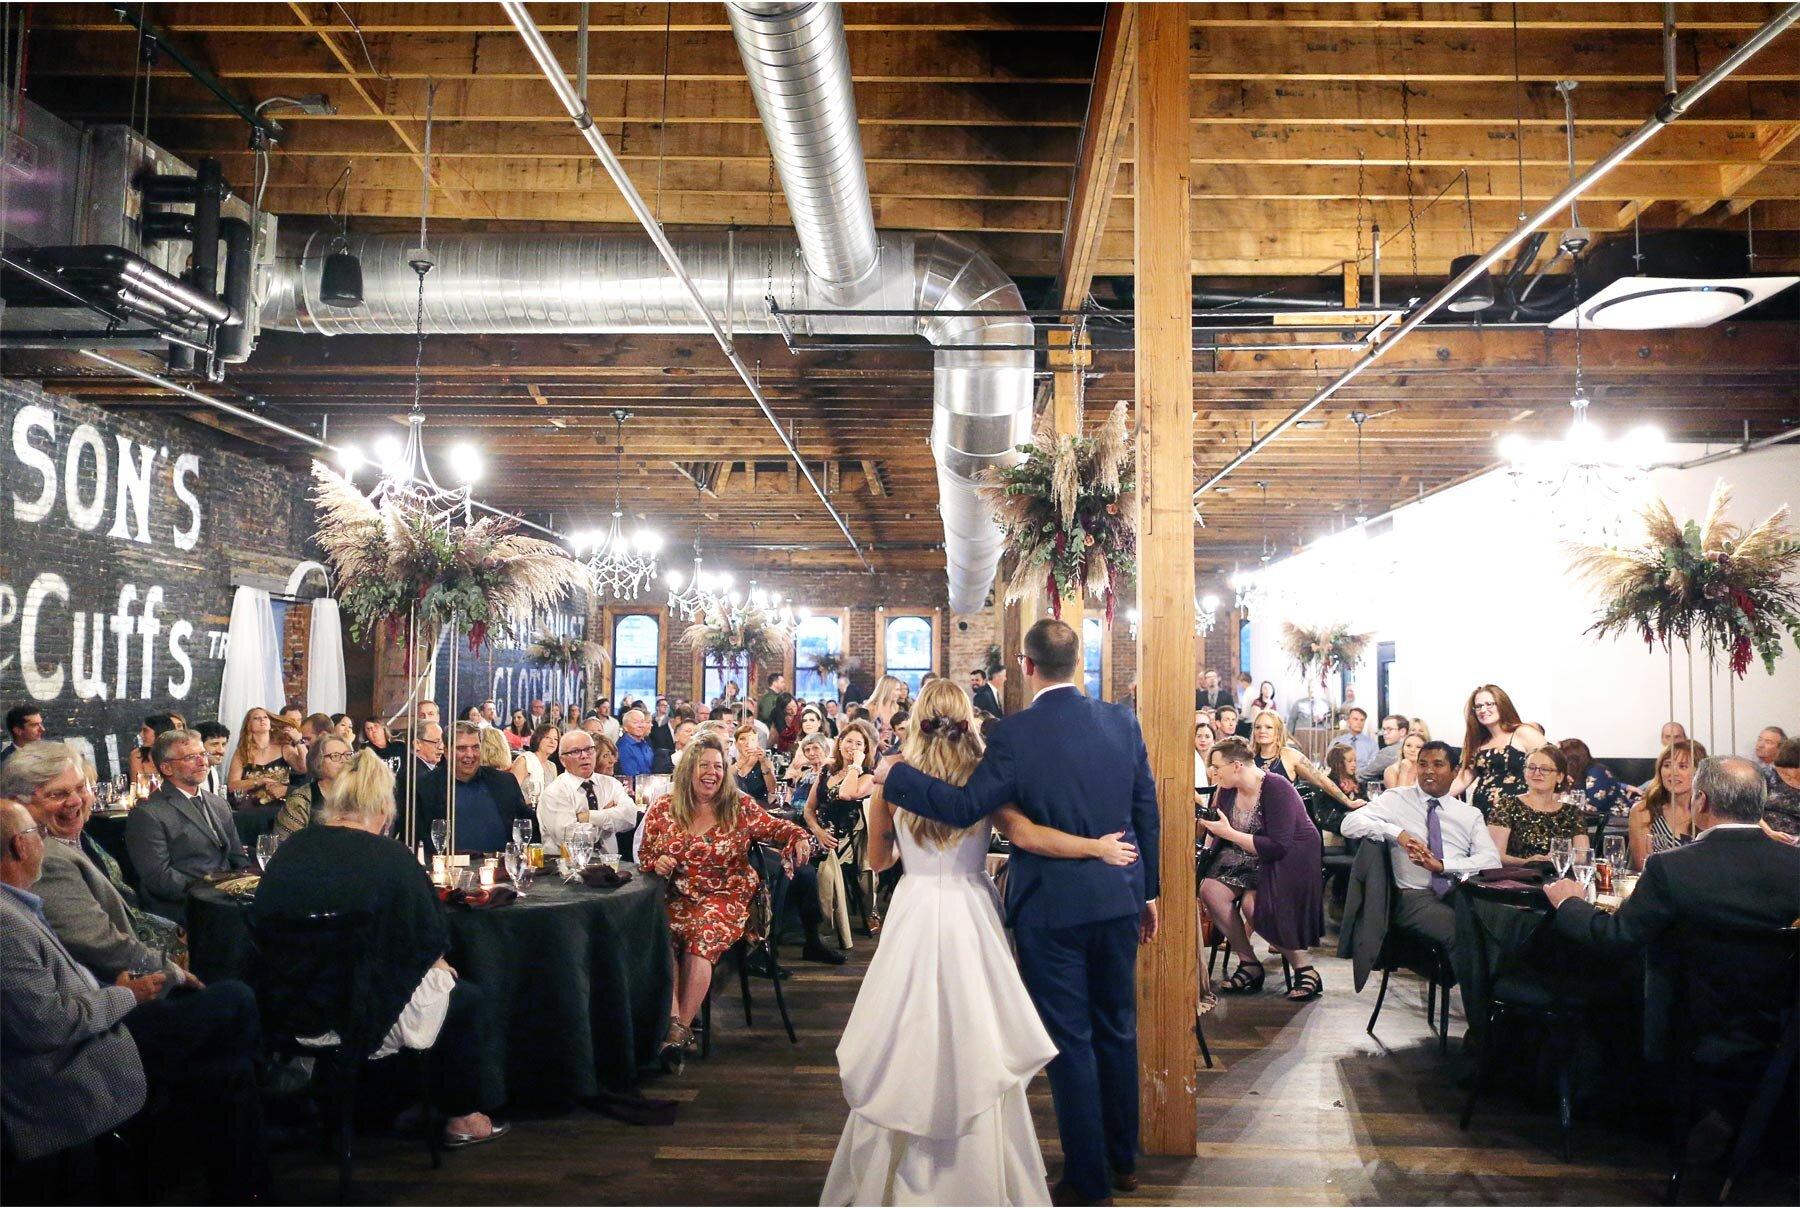 16-Vick-Photography-Wedding-Minneapolis-Minnesota-Earl-and-Wilson-Bride-Groom-Reception-Toast-Danielle-and-Tom.jpg